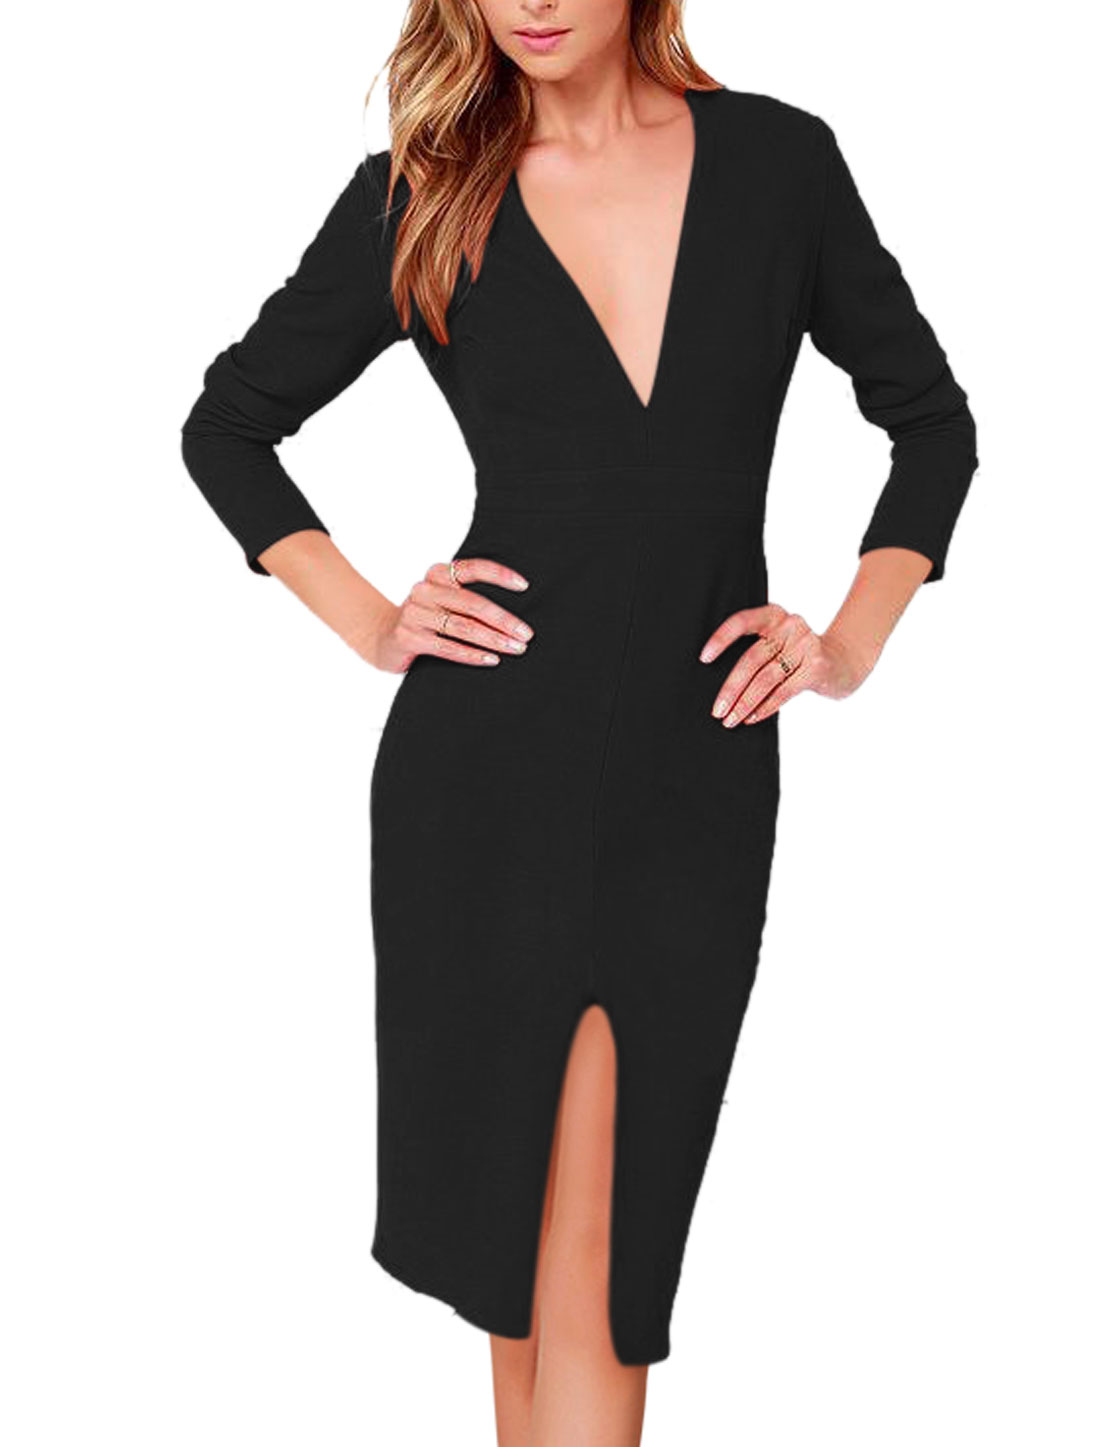 Woman Deep V Neck Long Sleeves Split Front Pencil Dress Black M